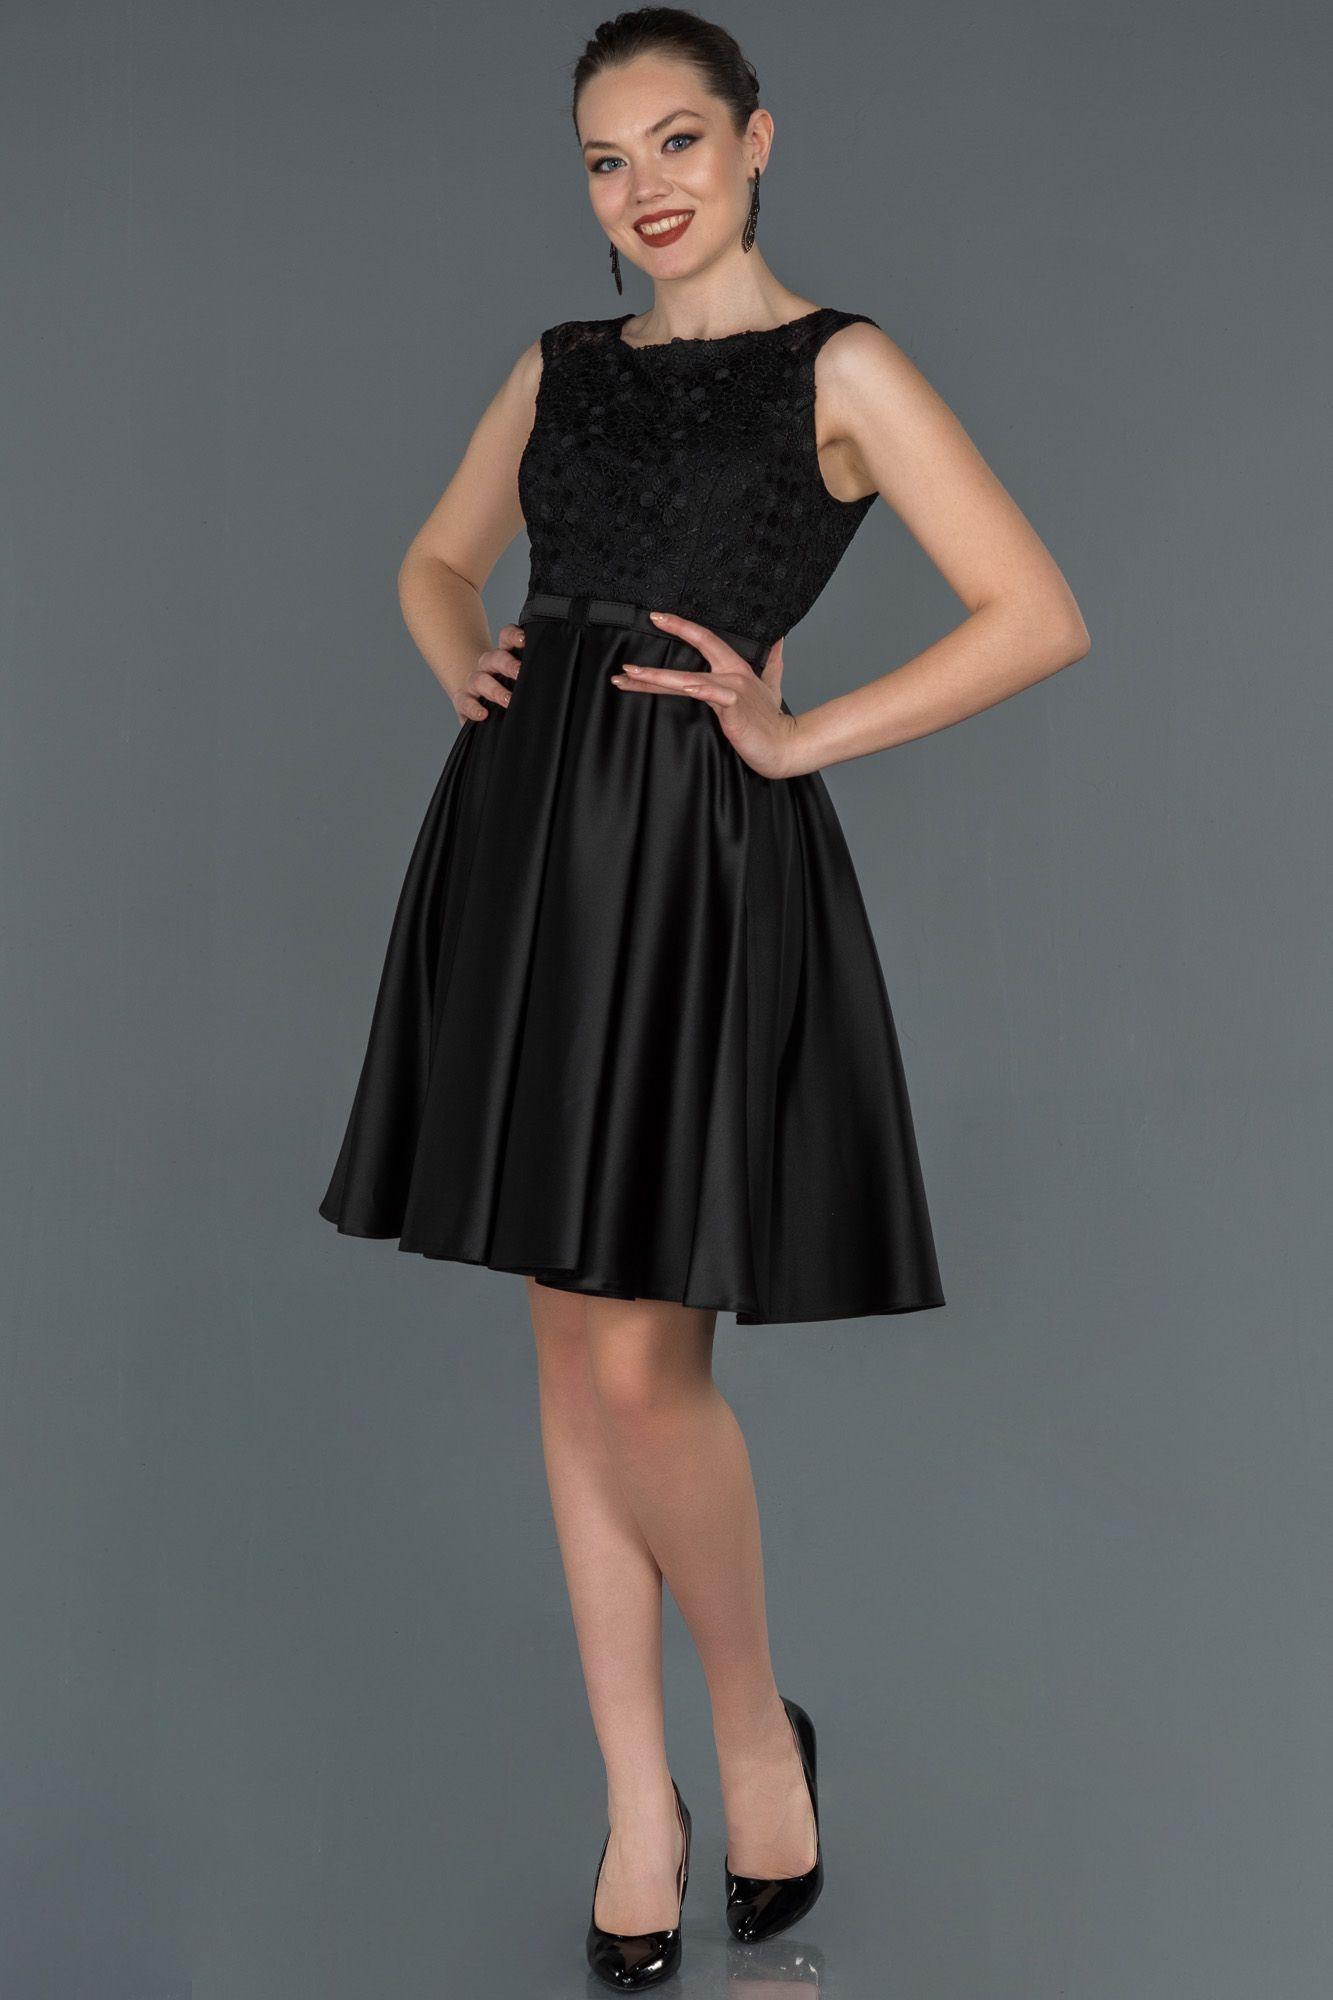 Siyah Kisa Gupur Detayli Saten Abiye Elbise Abk750 2020 The Dress Elbise Moda Stilleri